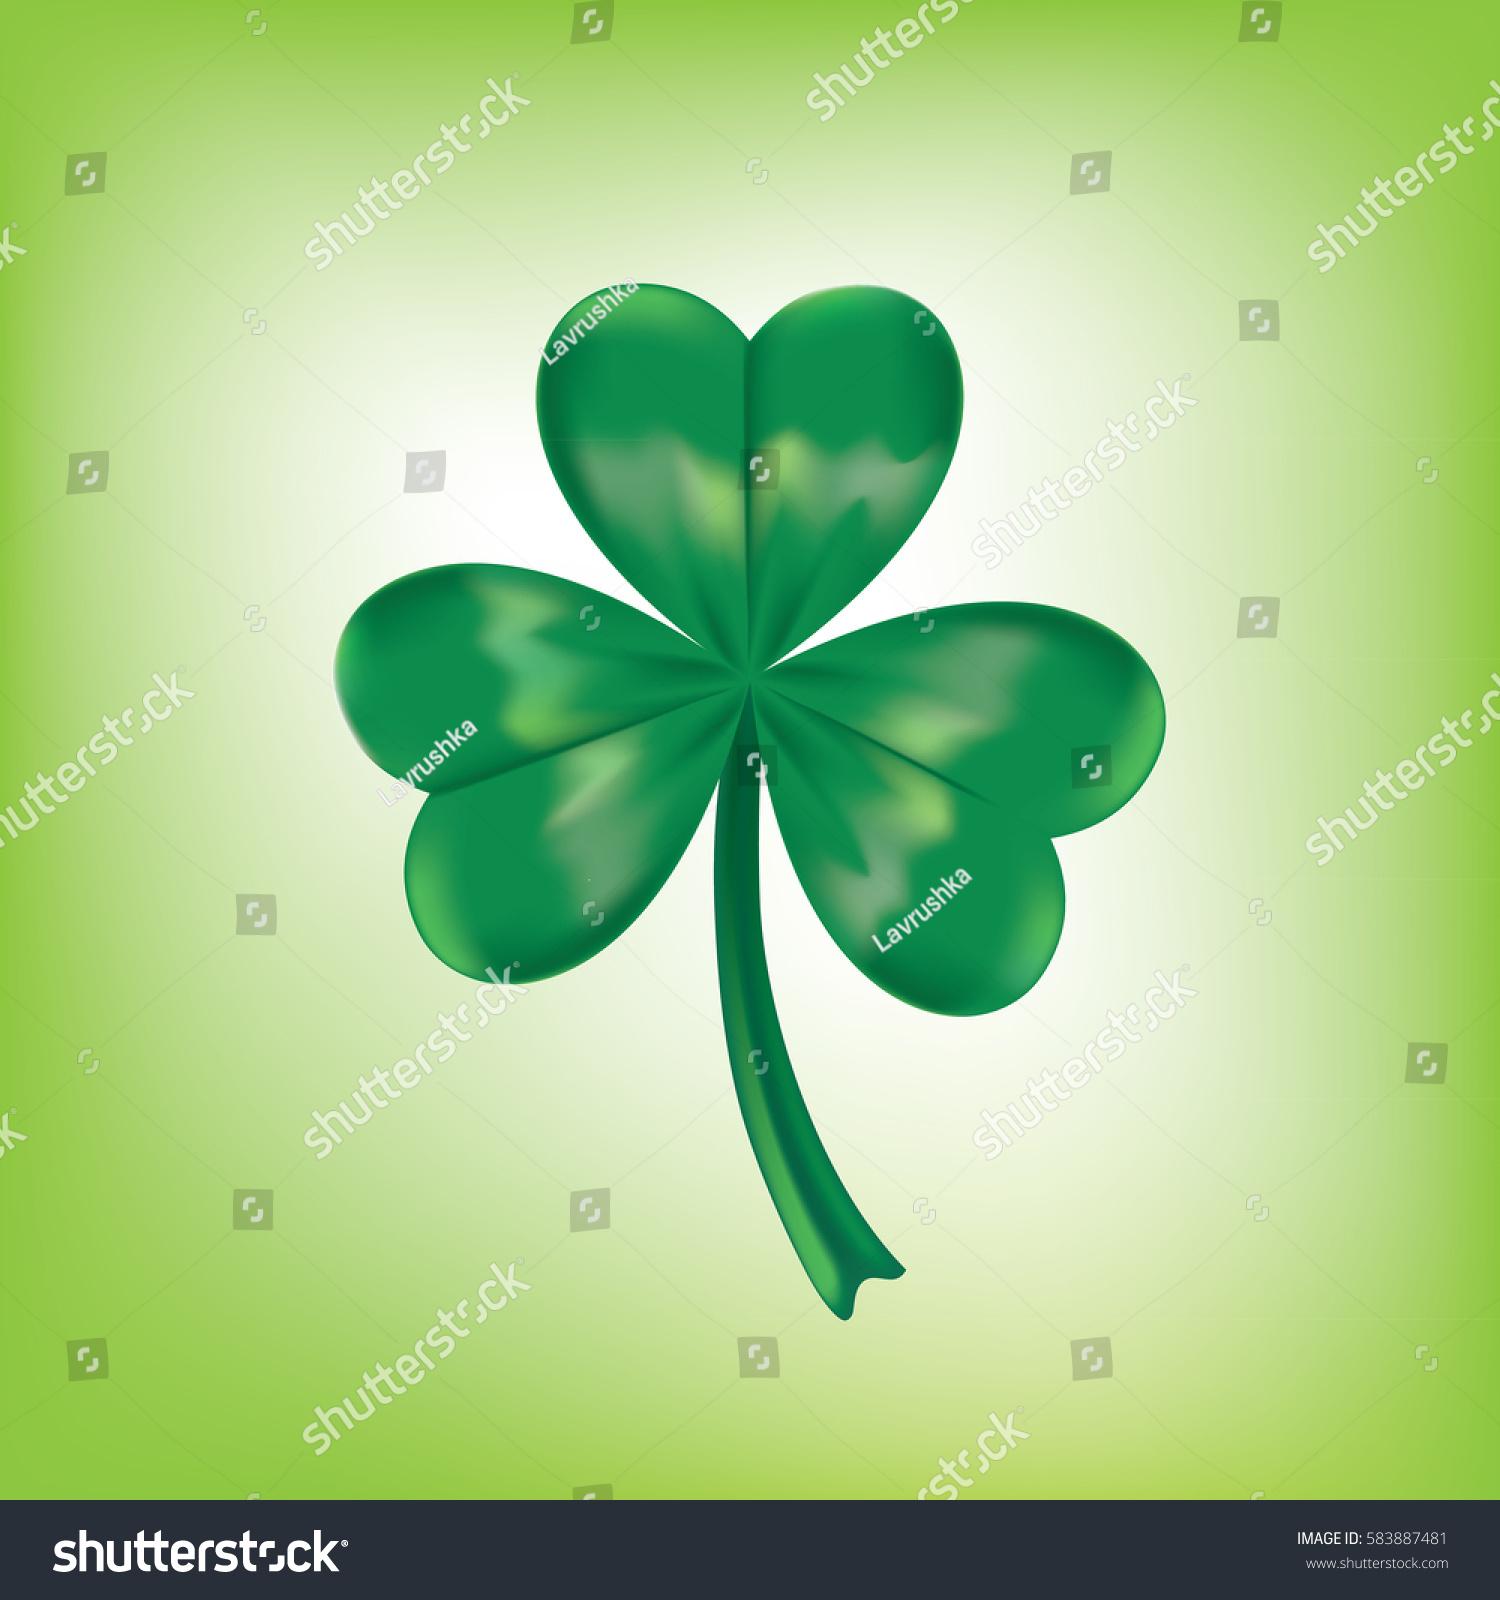 Vector leaf clover shamrock irish symbol stock vector 583887481 vector leaf clover shamrock irish symbol the traditional symbol of st patricks biocorpaavc